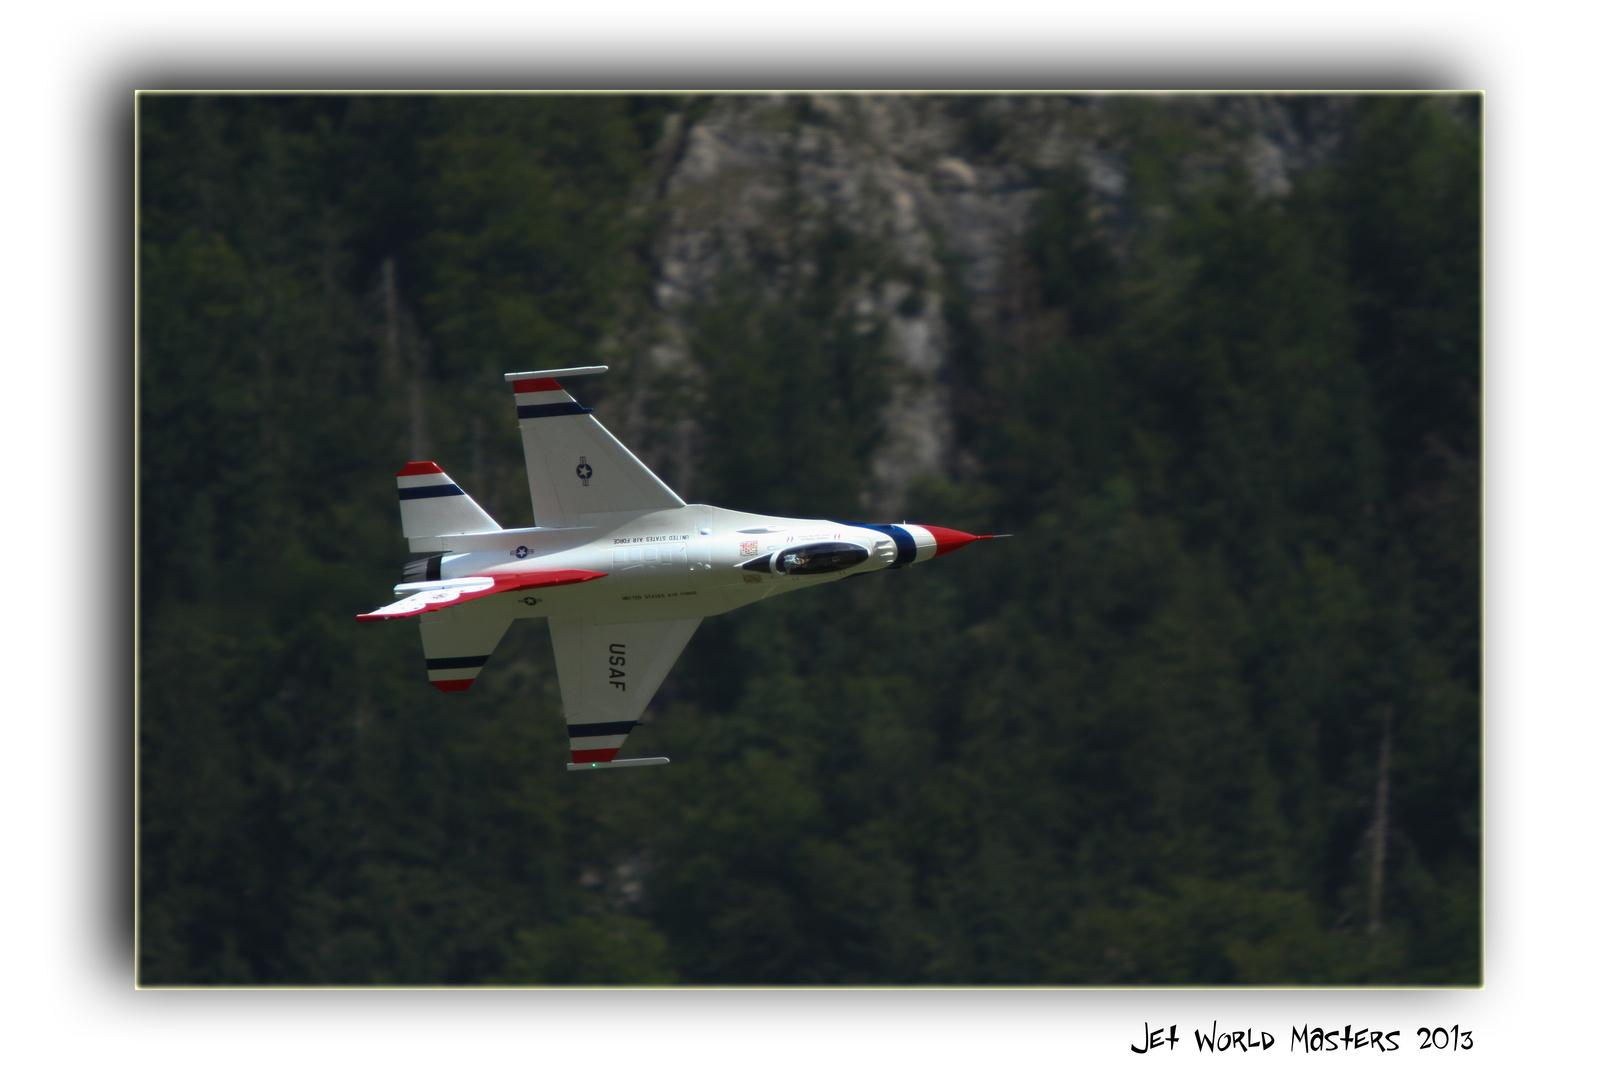 Jet World Masters 2013..